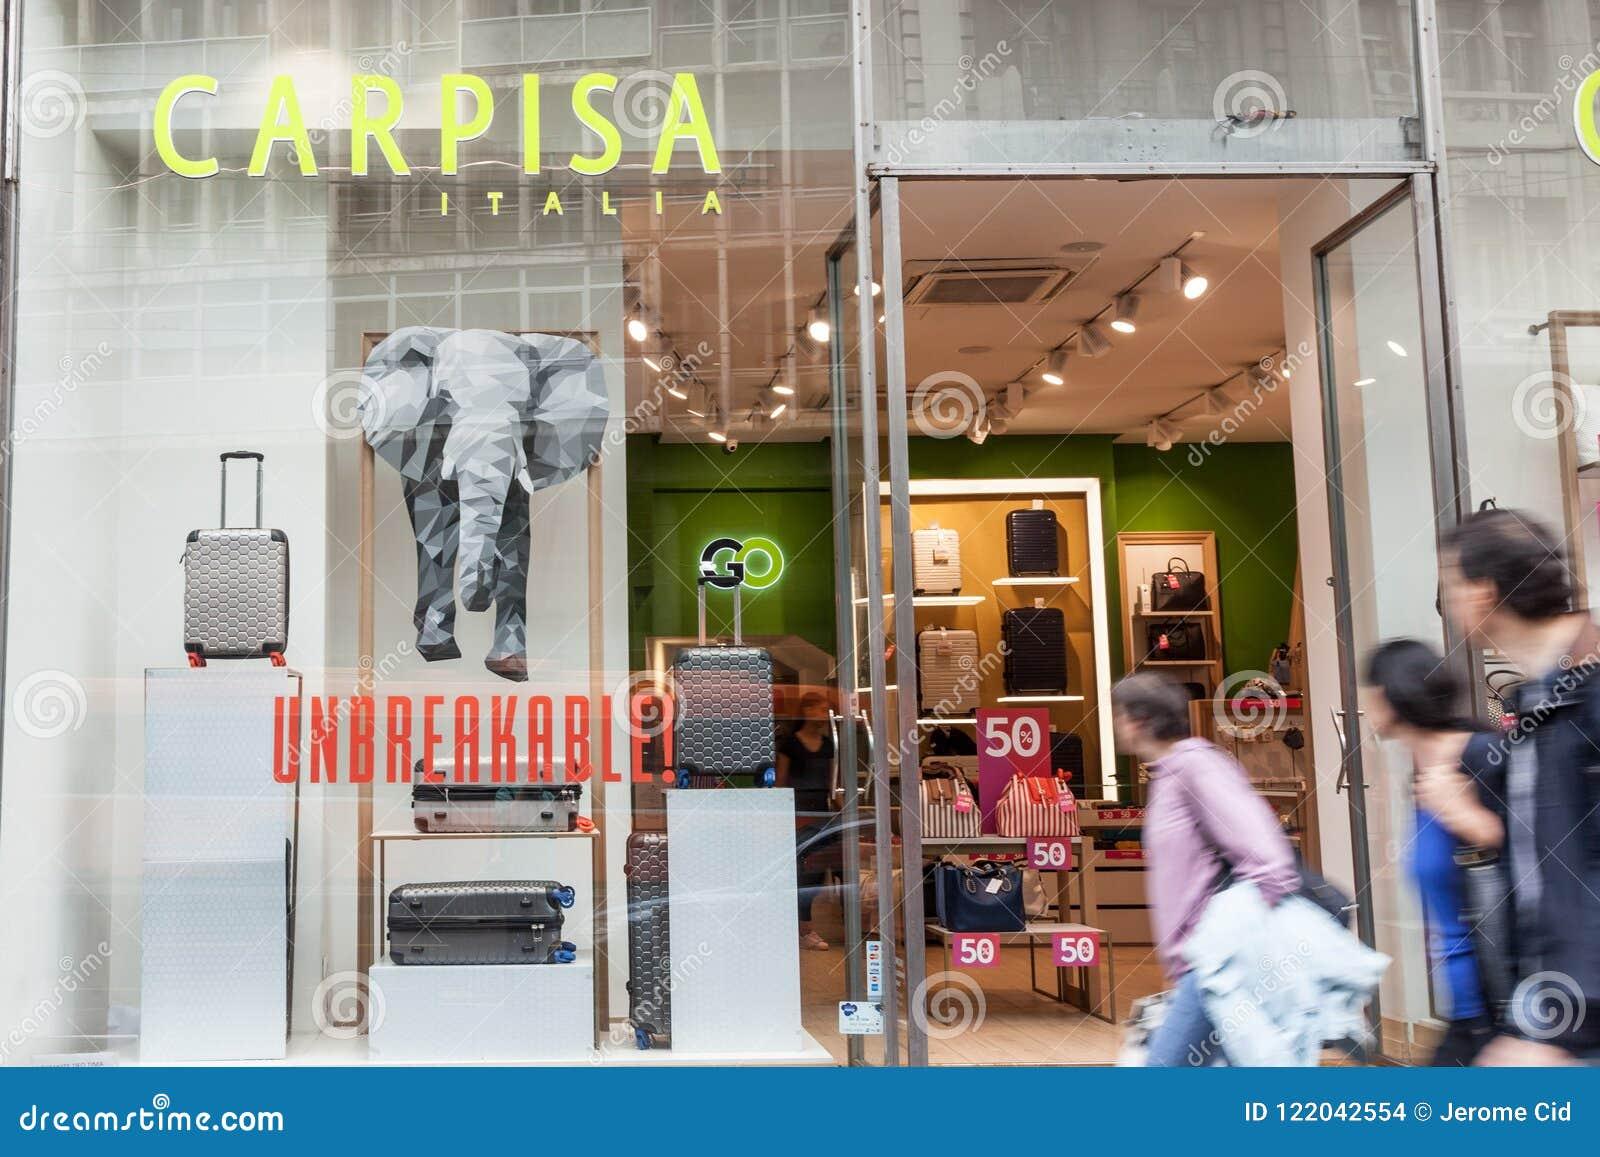 3a78a5e1d2 Logo Of Carpisa On Their Main Stores In Belgrade. Carpisa Is An ...